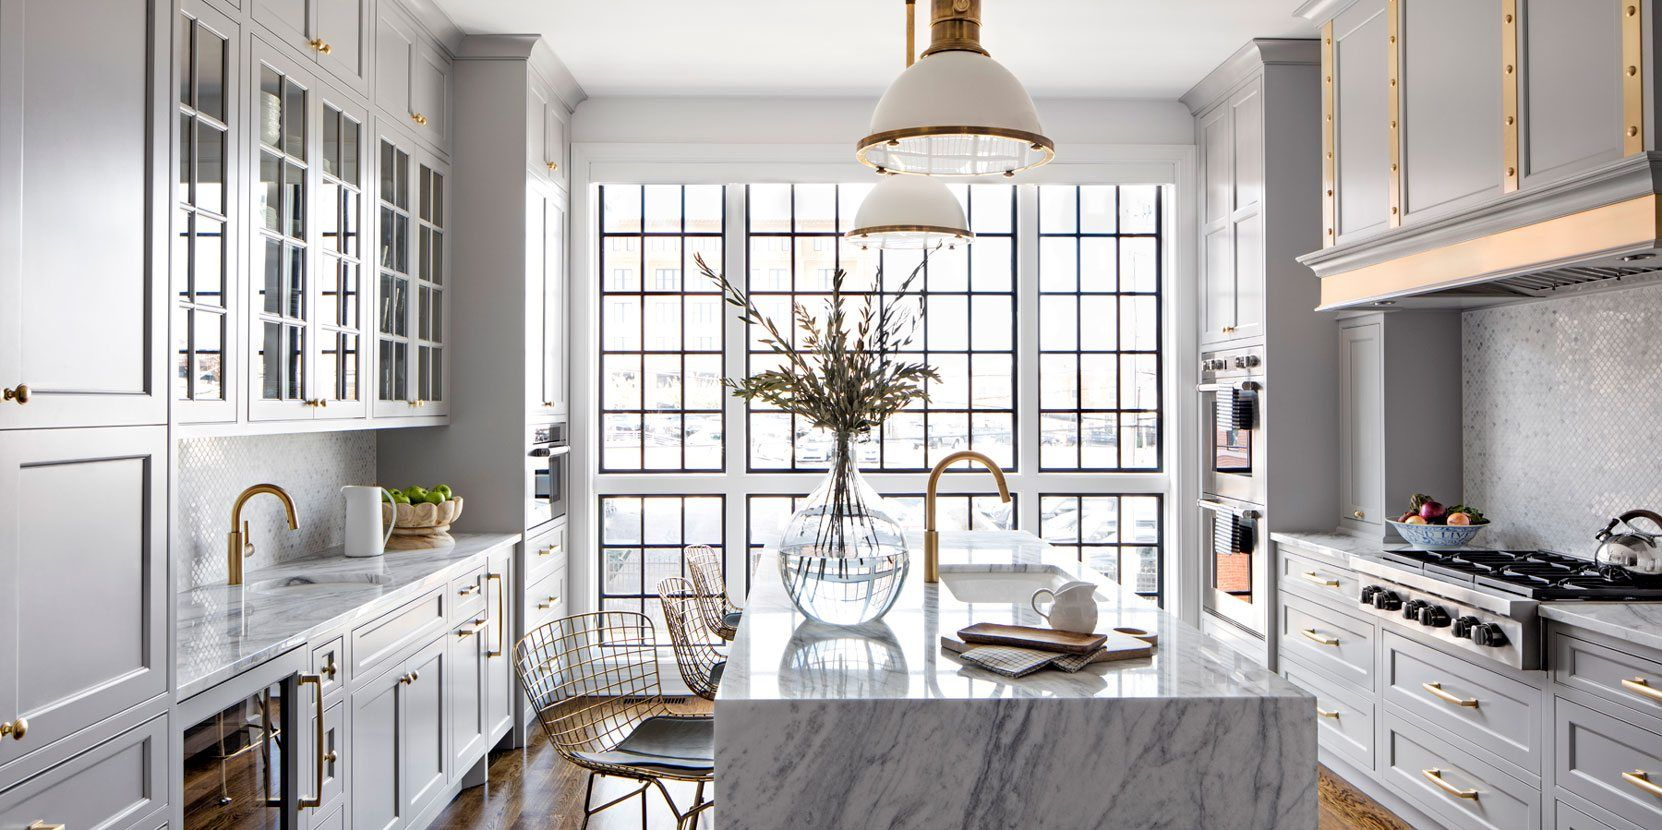 Open Kitchen | Bria Hammel Interiors | Kitchens | Pinterest | Open ...